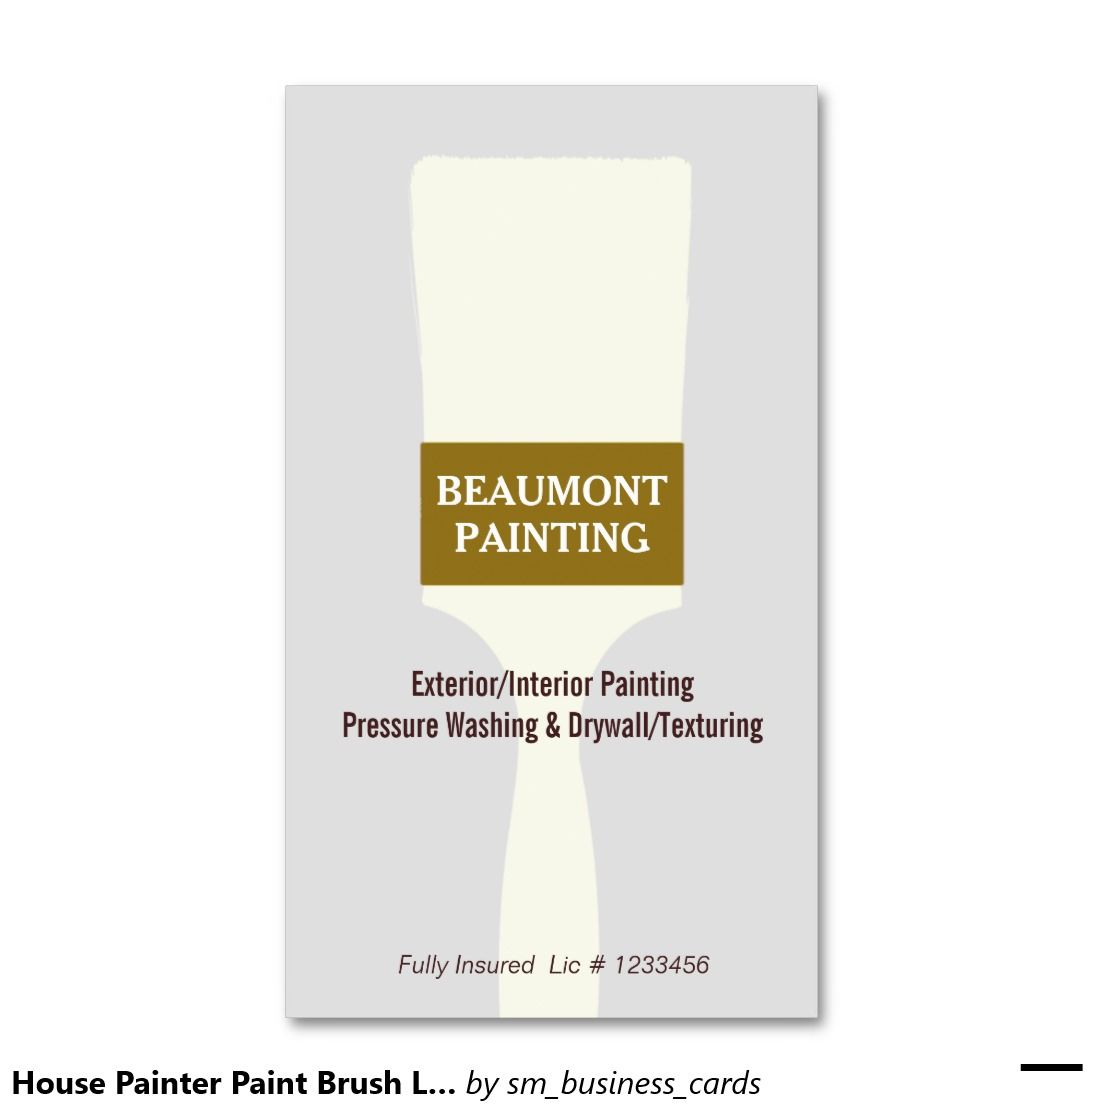 House Painter Paint Brush Logo 2 Business Card   House painter ...